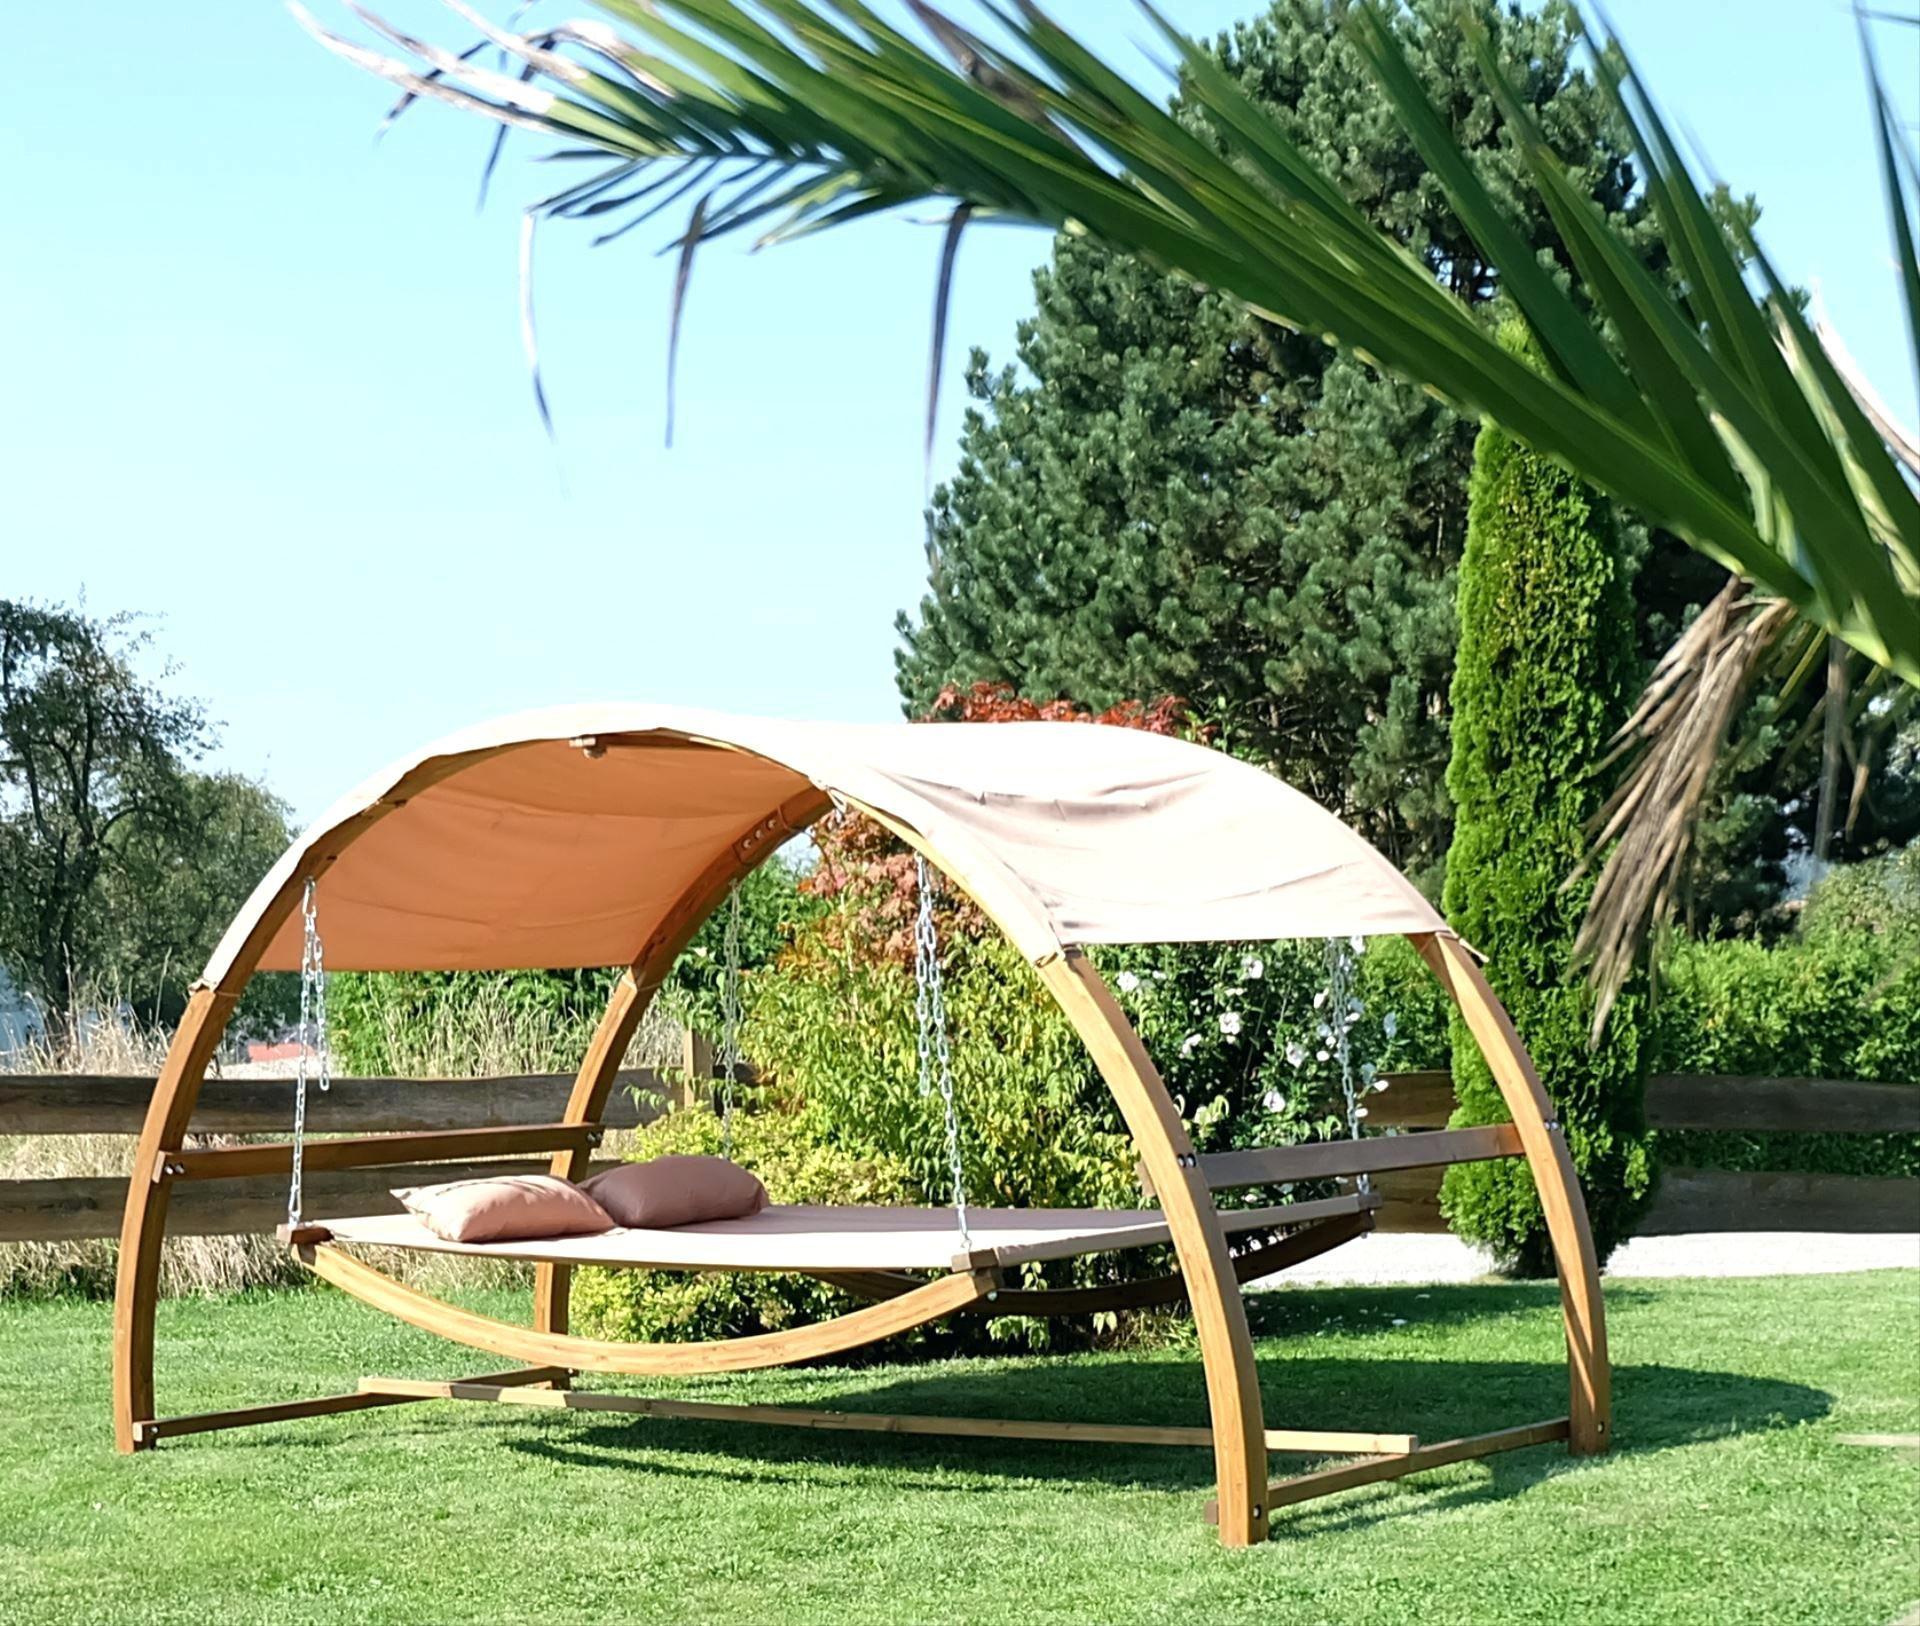 Doppel Gartenliege Zoom Sonnenliege Selber Bauen Holz Rattan